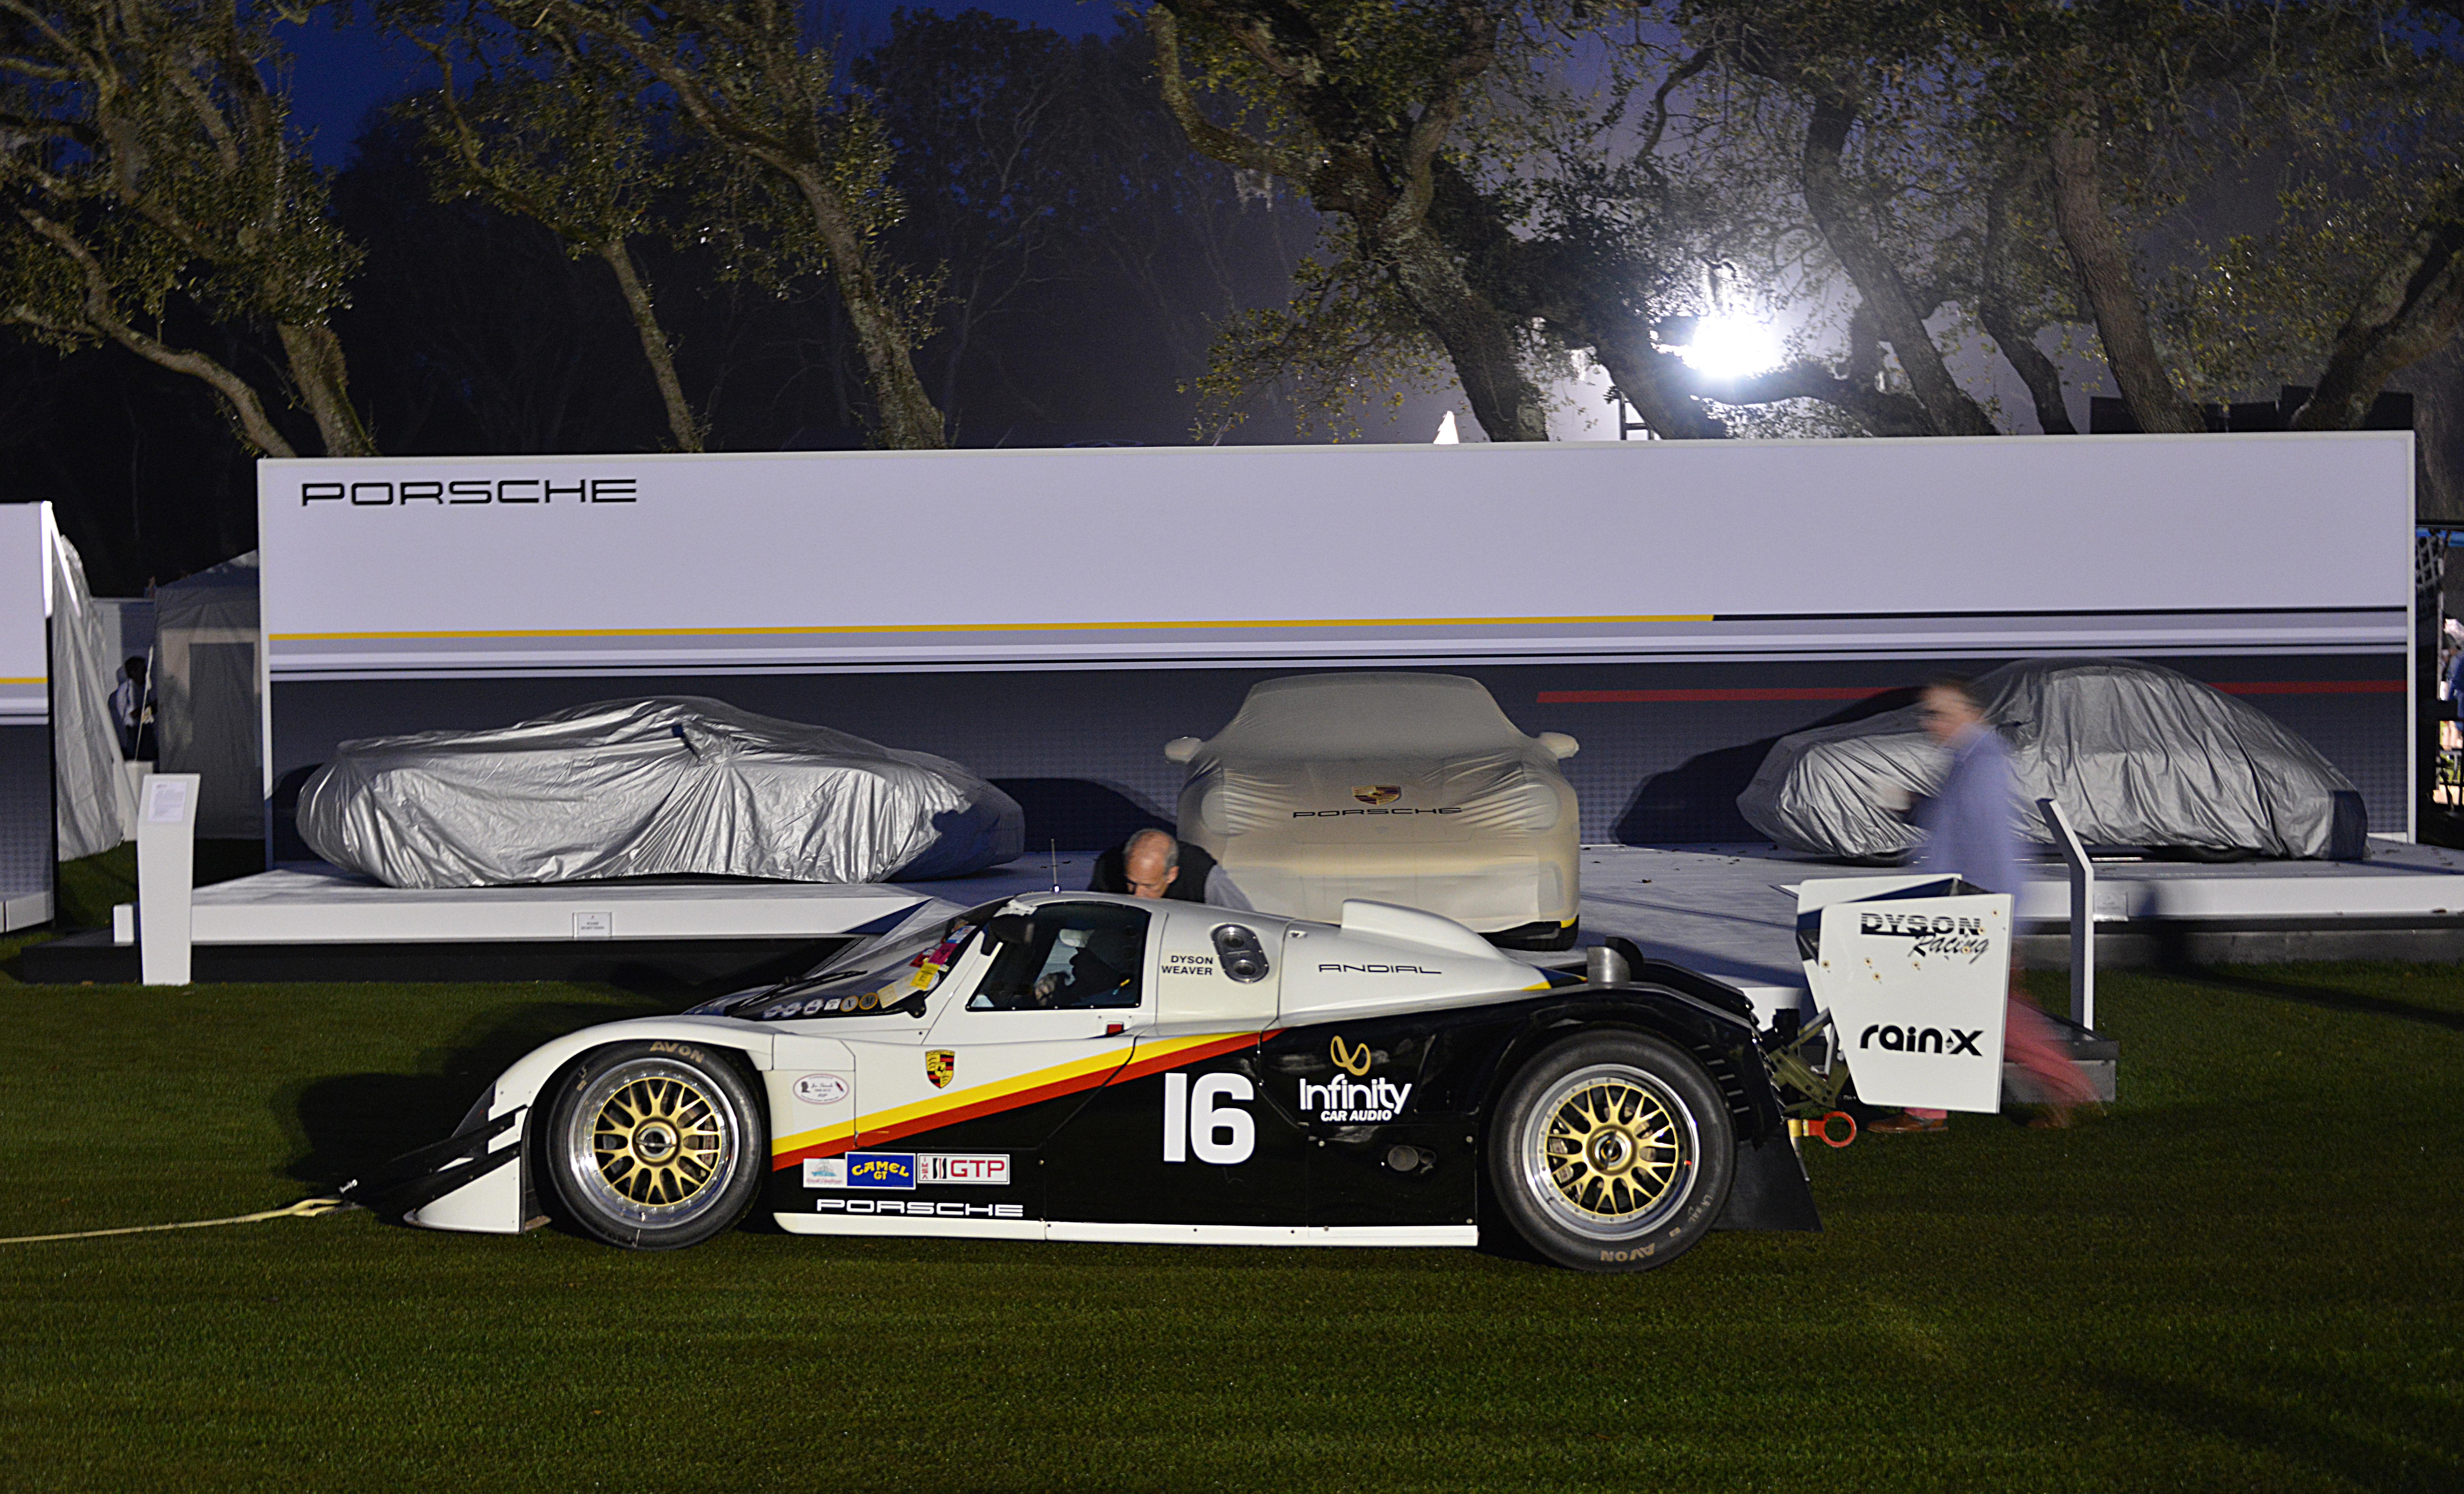 Porsche 962, 962: Dominating Porsche prototype racer, ClassicCars.com Journal